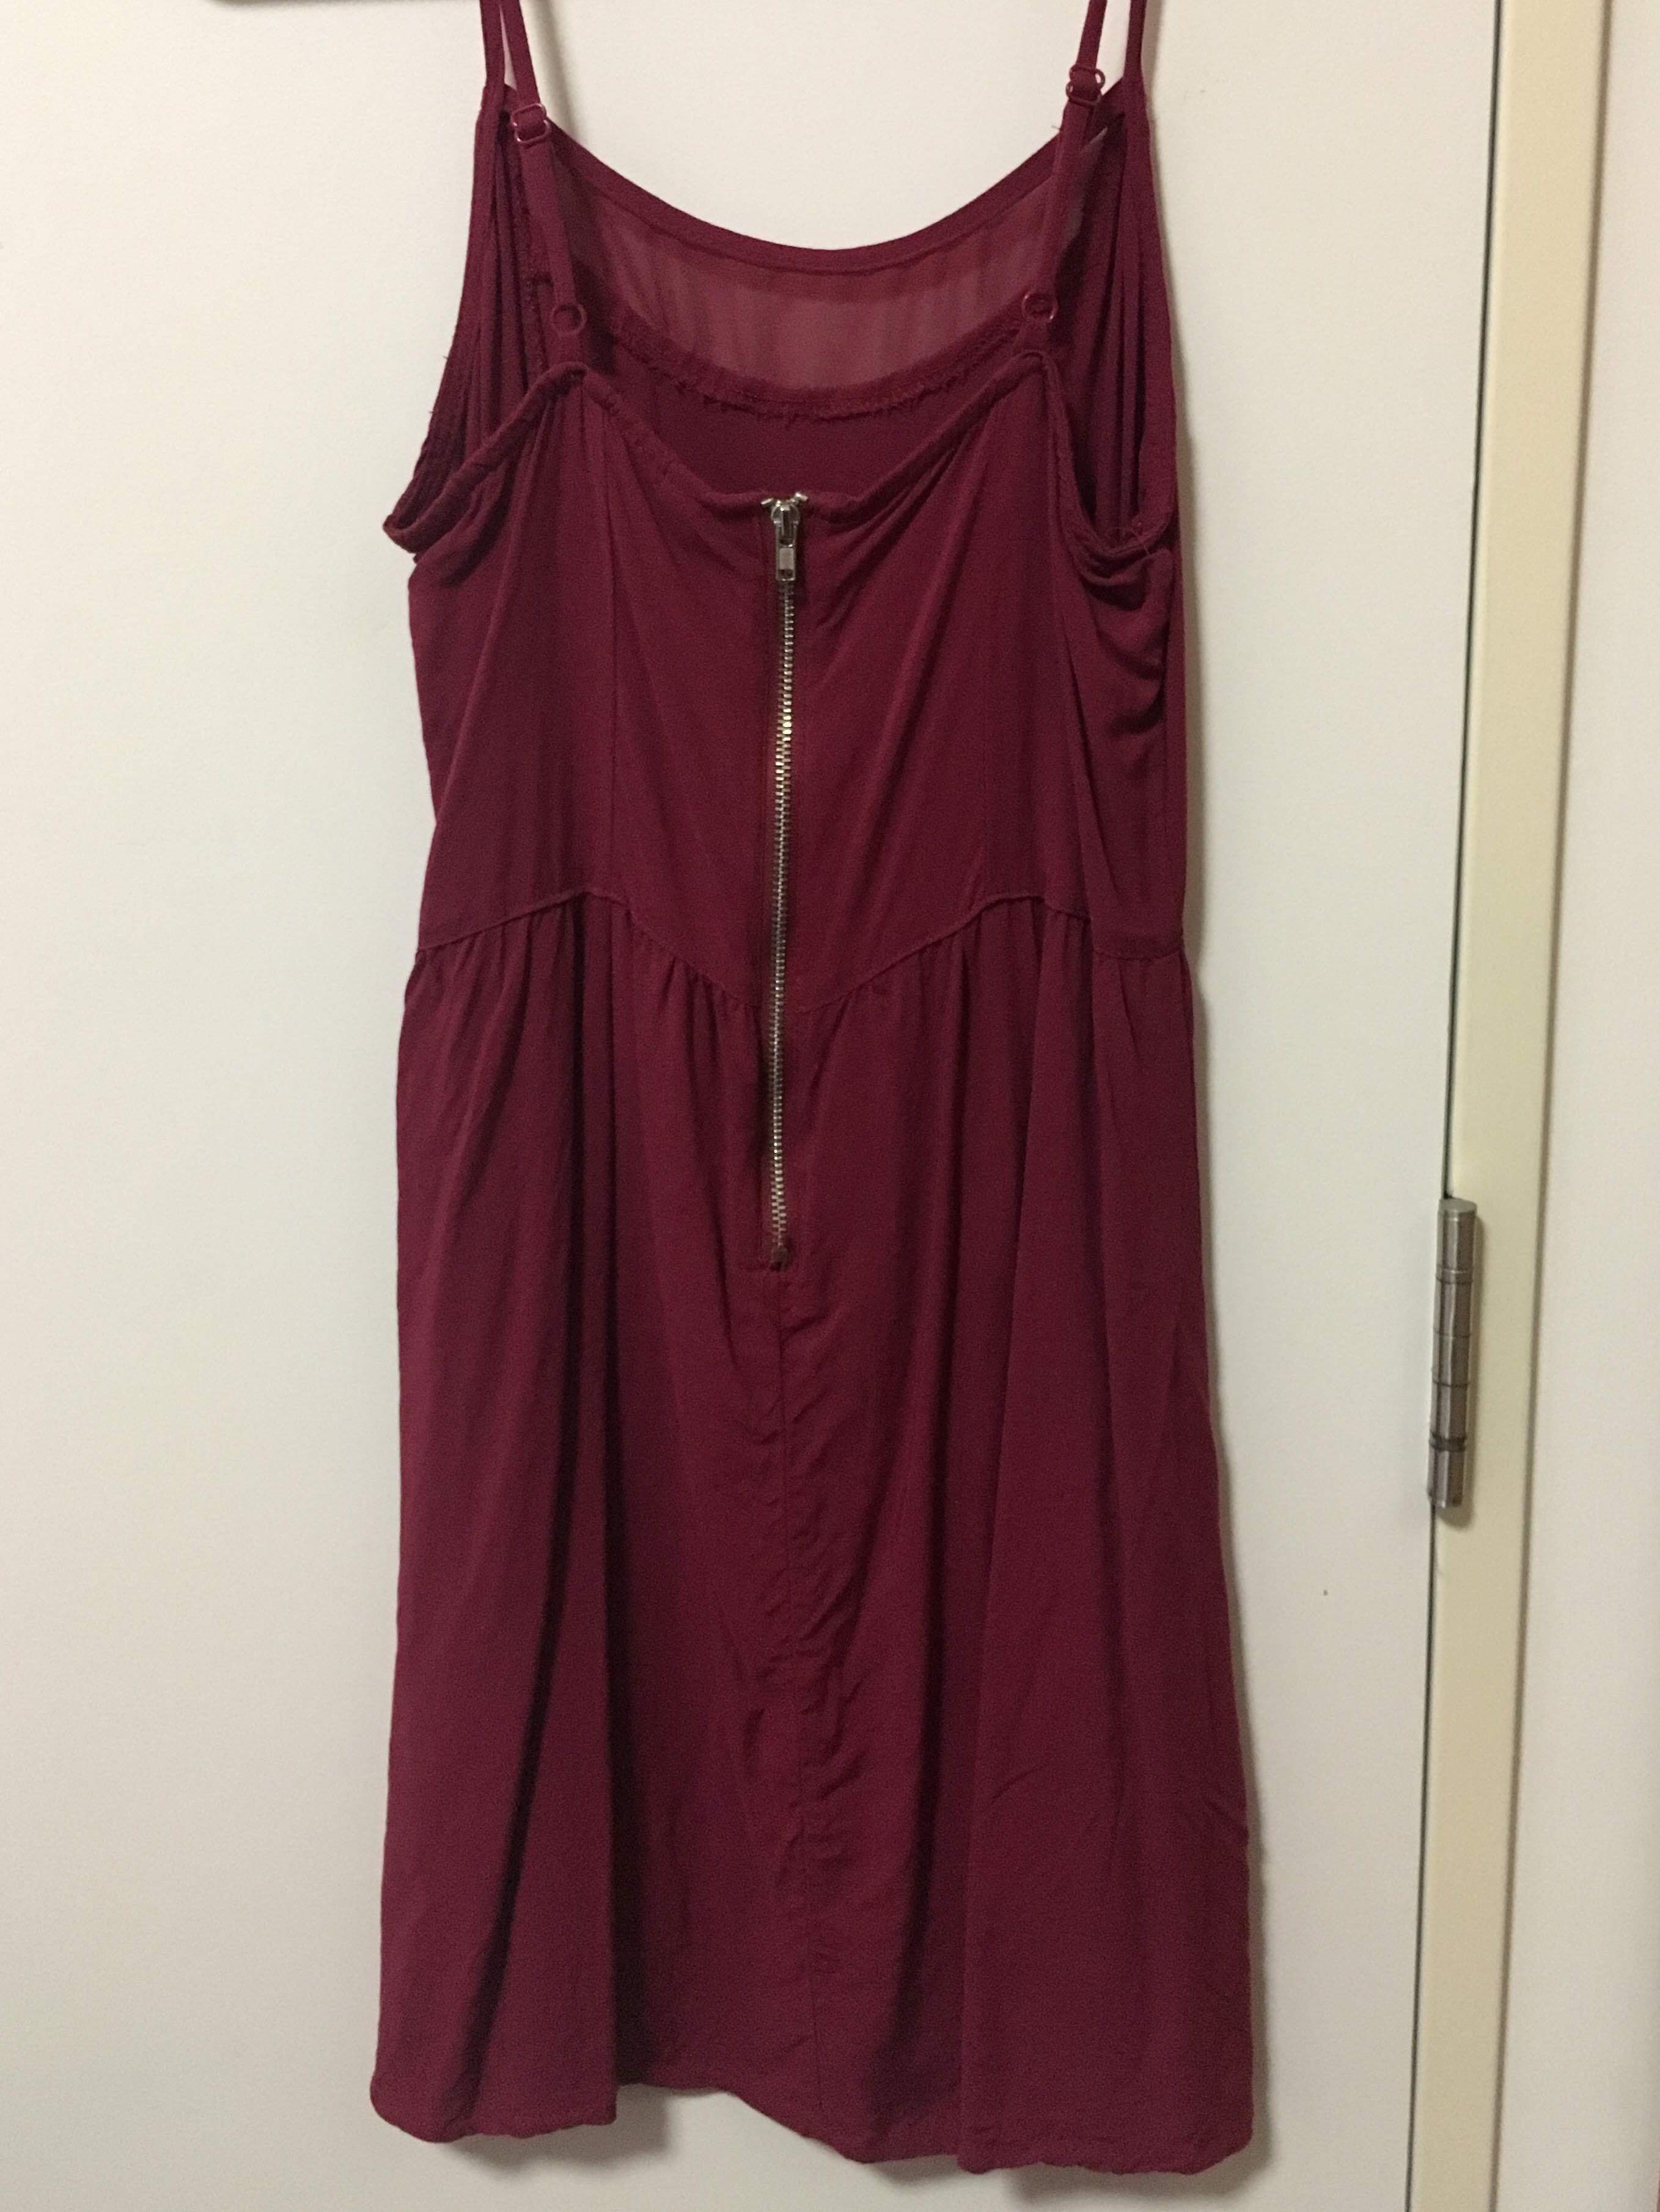 H&M maroon thin strap dress